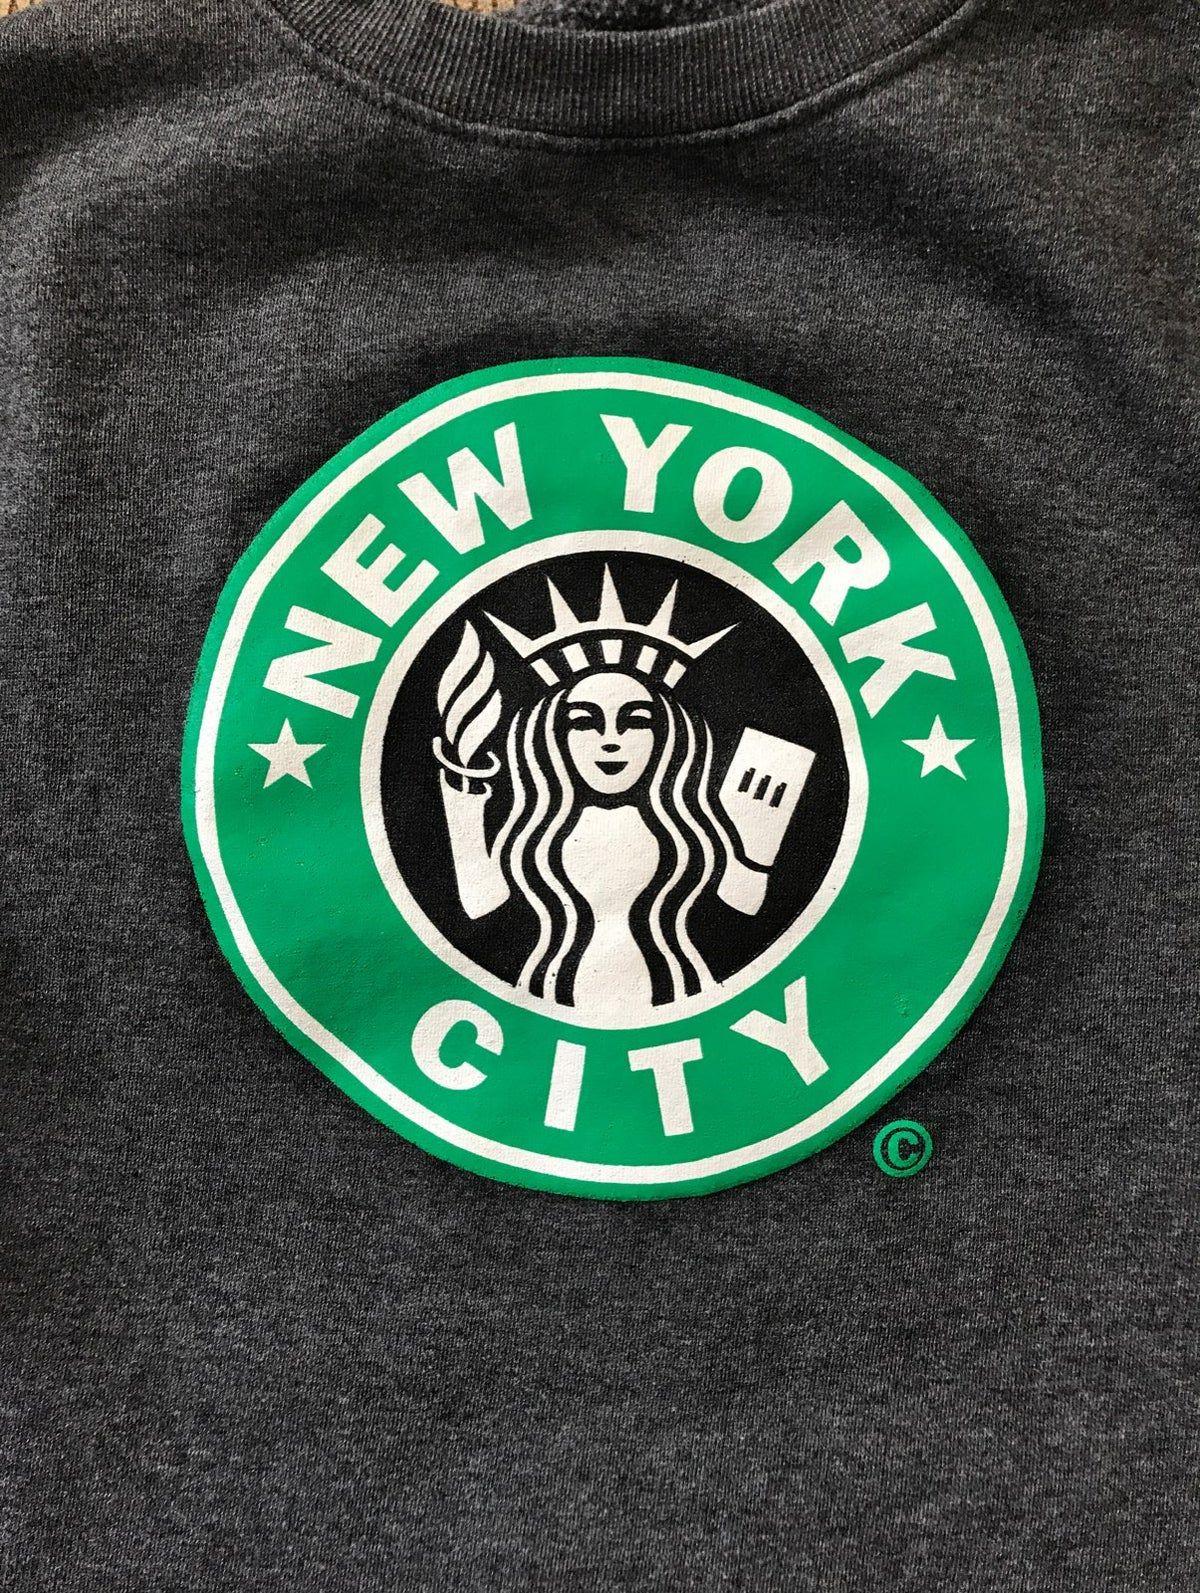 Pin By Mayra Hernandez On Guardado Rapido In 2021 Nyc Starbucks Starbucks Logo [ 1593 x 1200 Pixel ]